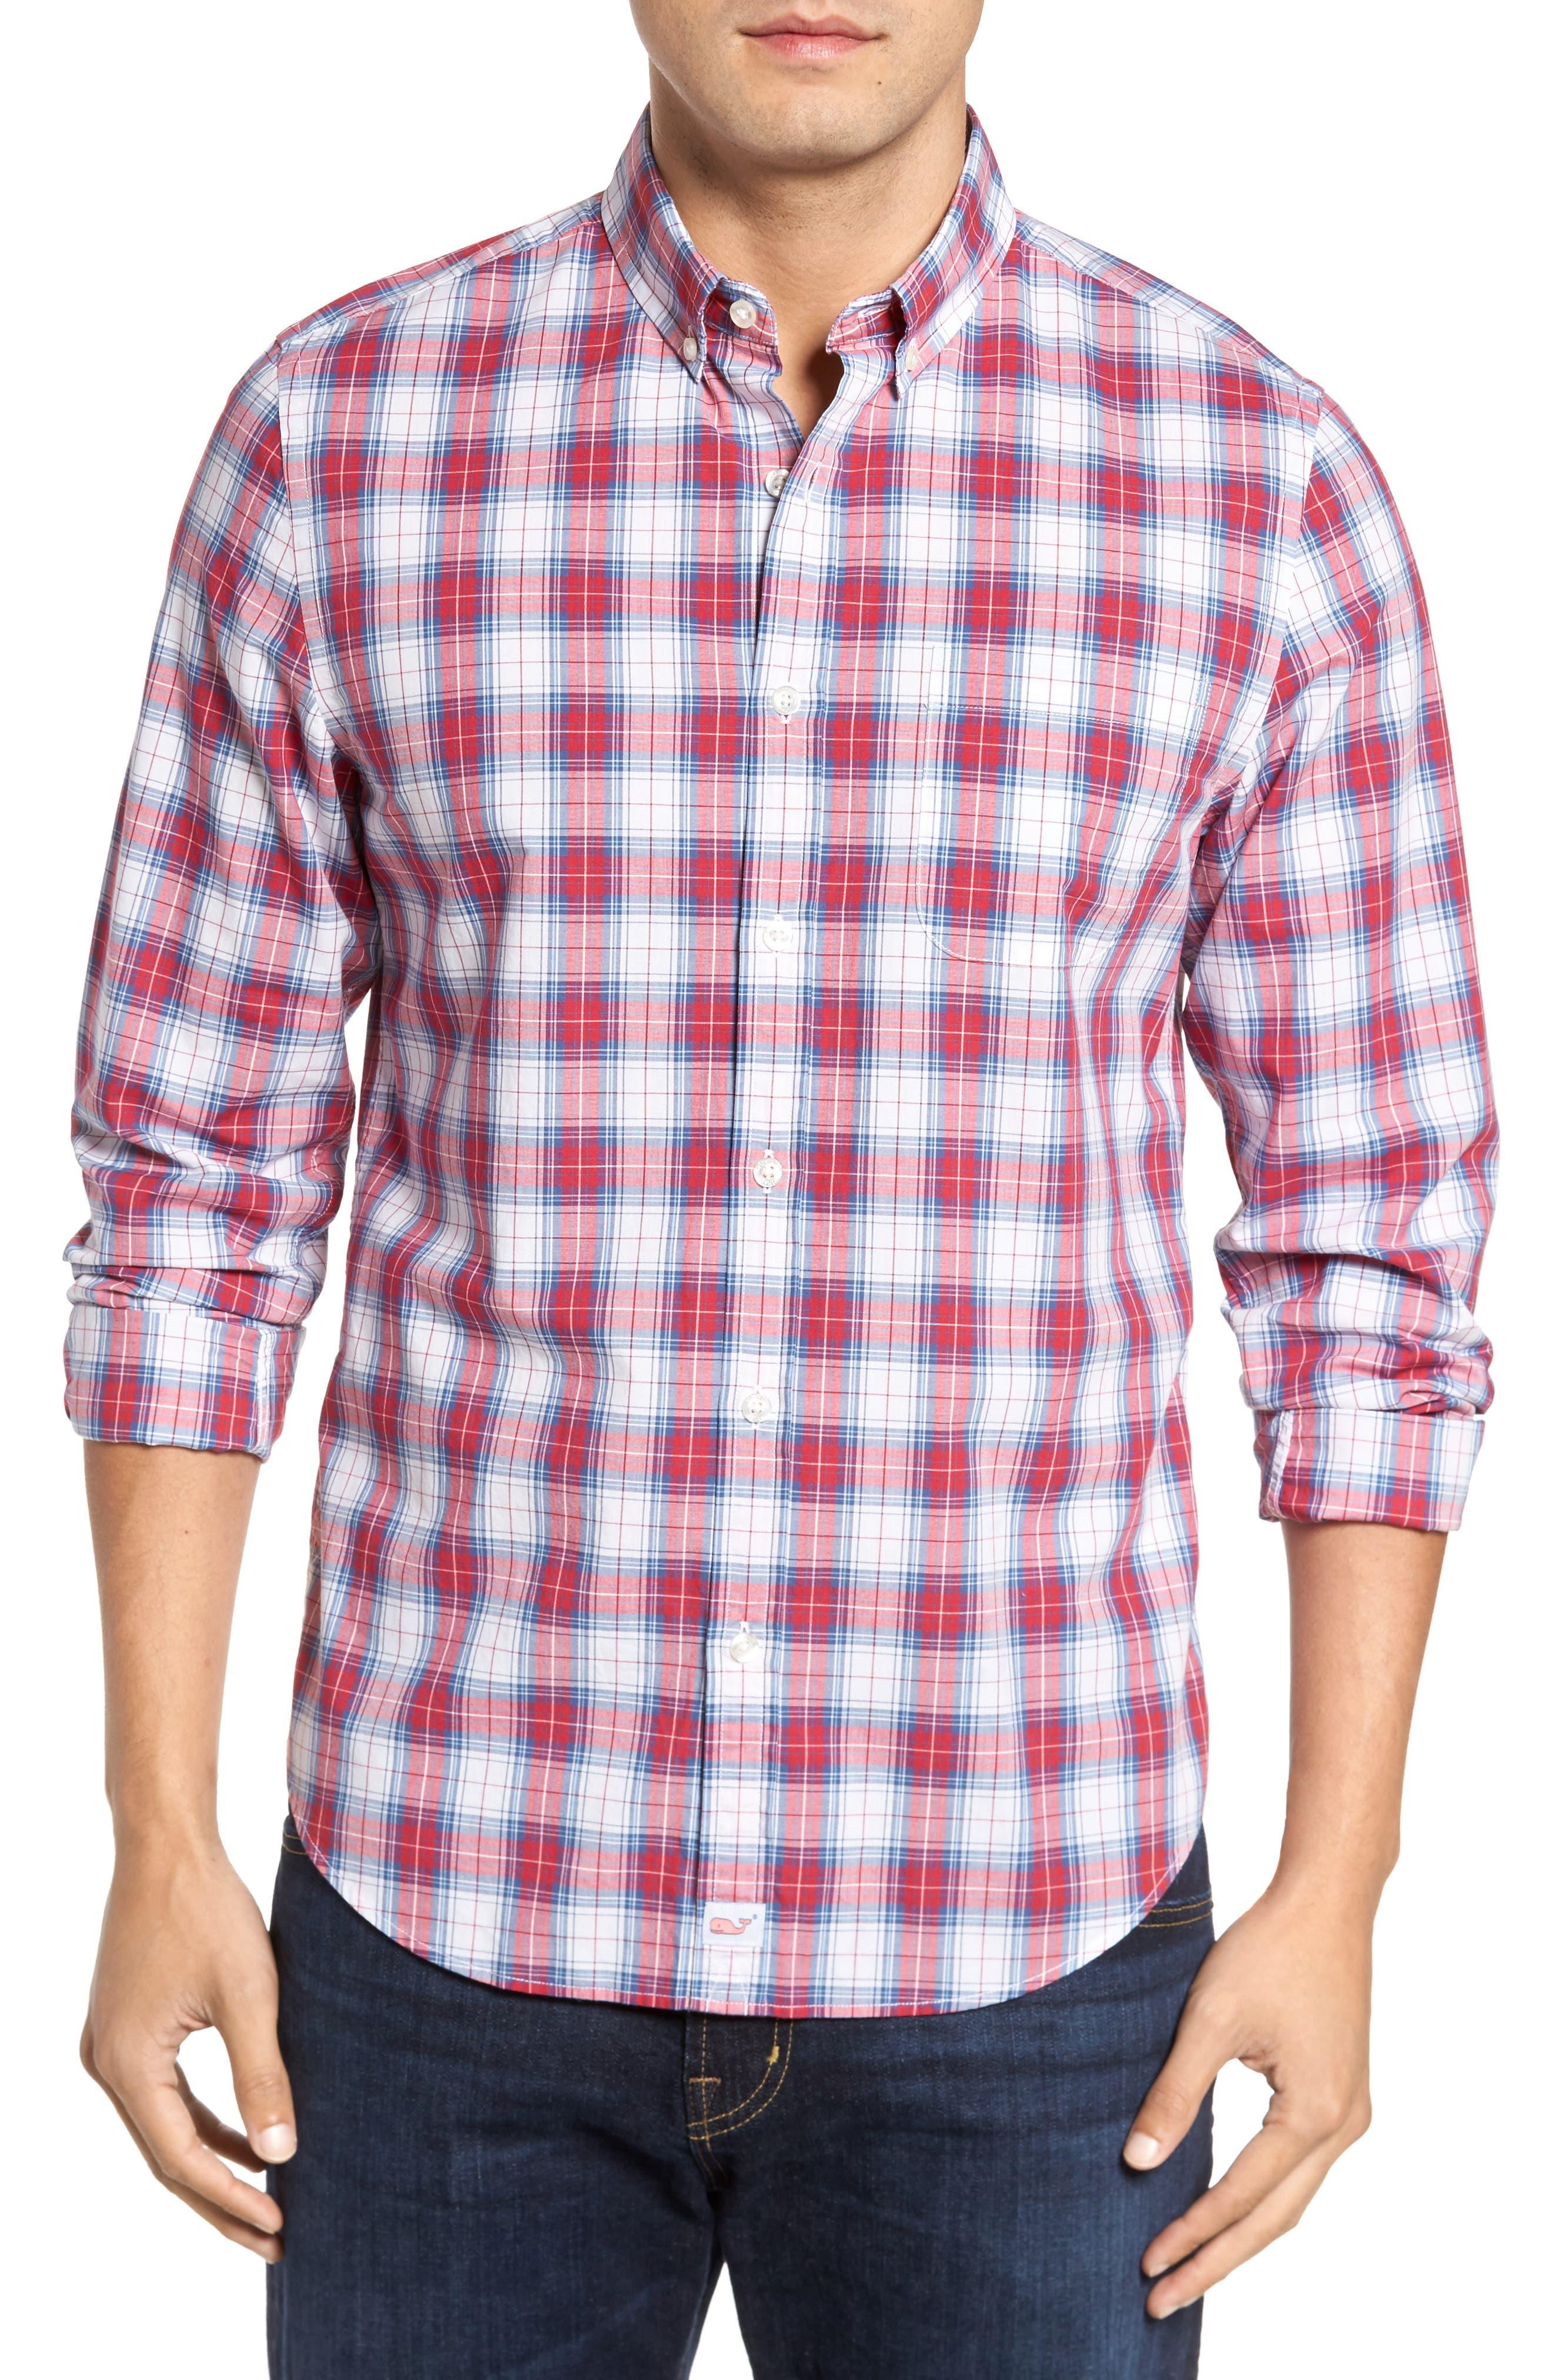 Murray Bucklin Point Slim Fit Plaid Sport Shirt,                             Main thumbnail 1, color,